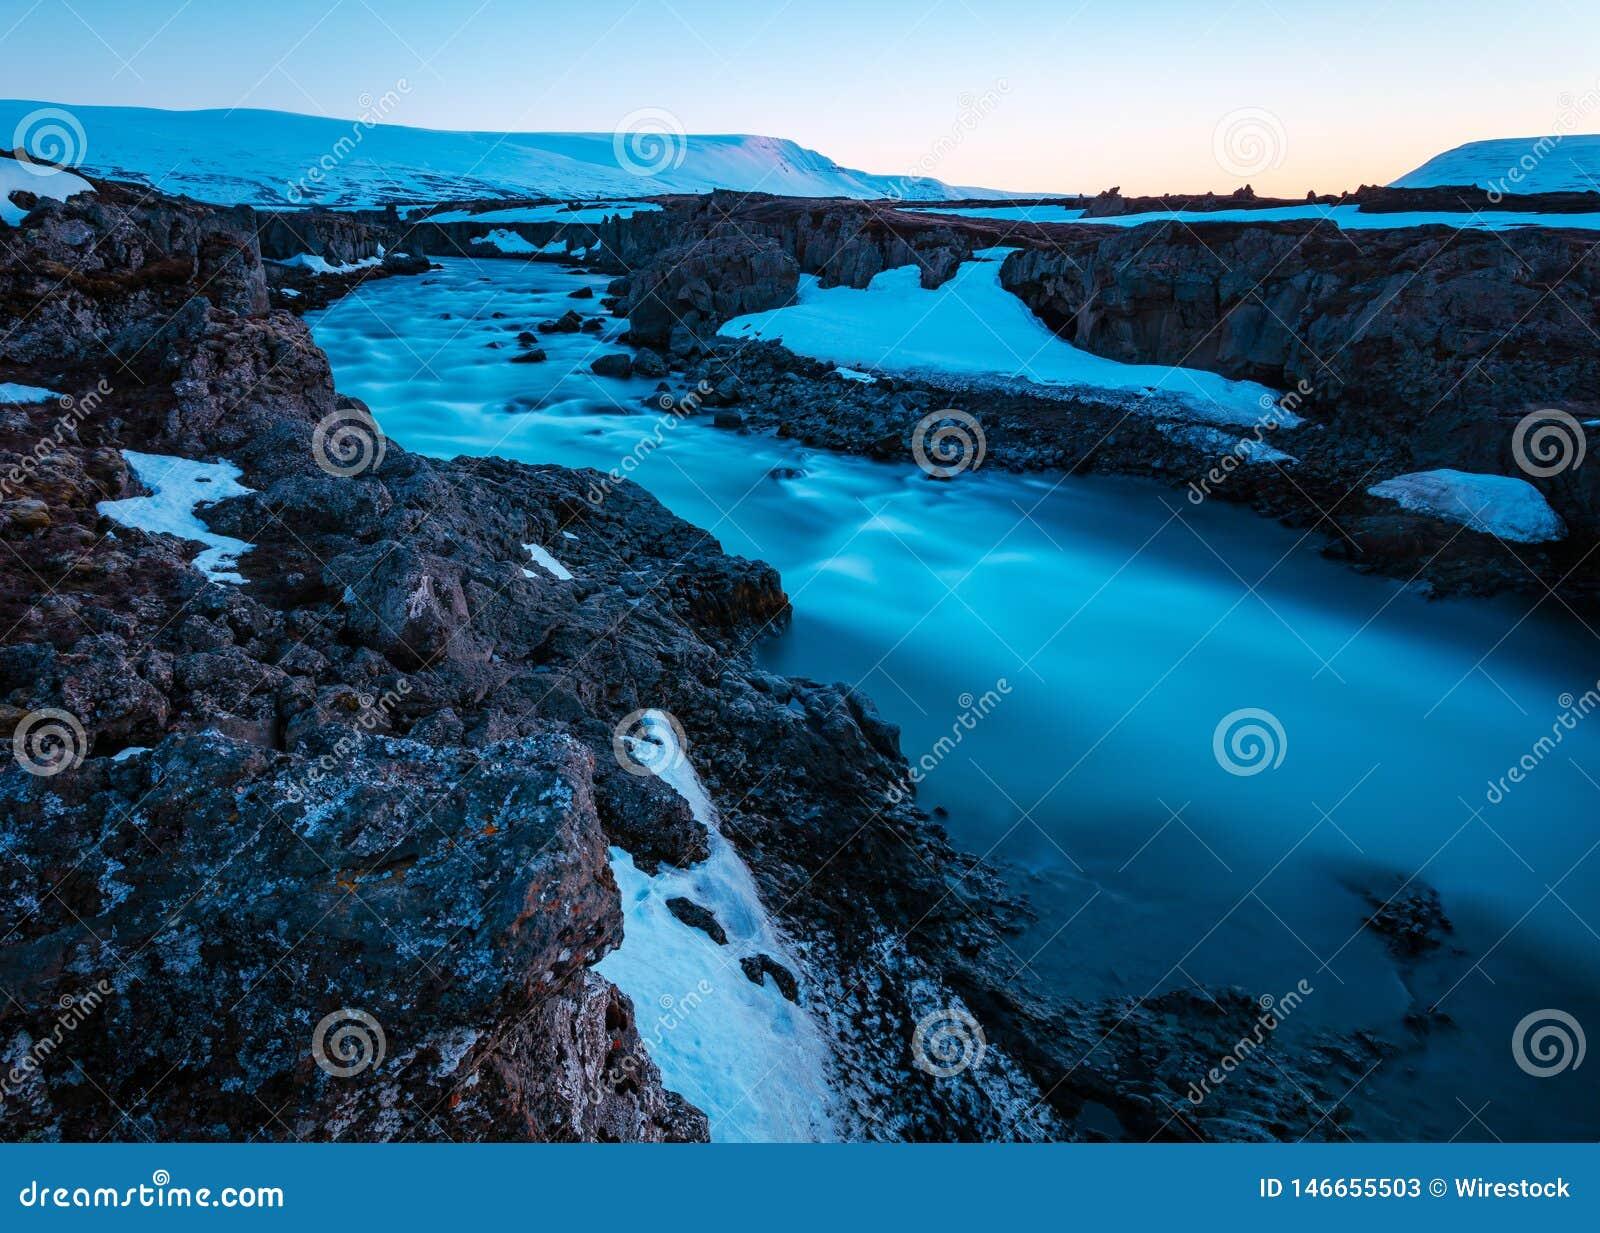 Beautiful shot of a river in a rocky field